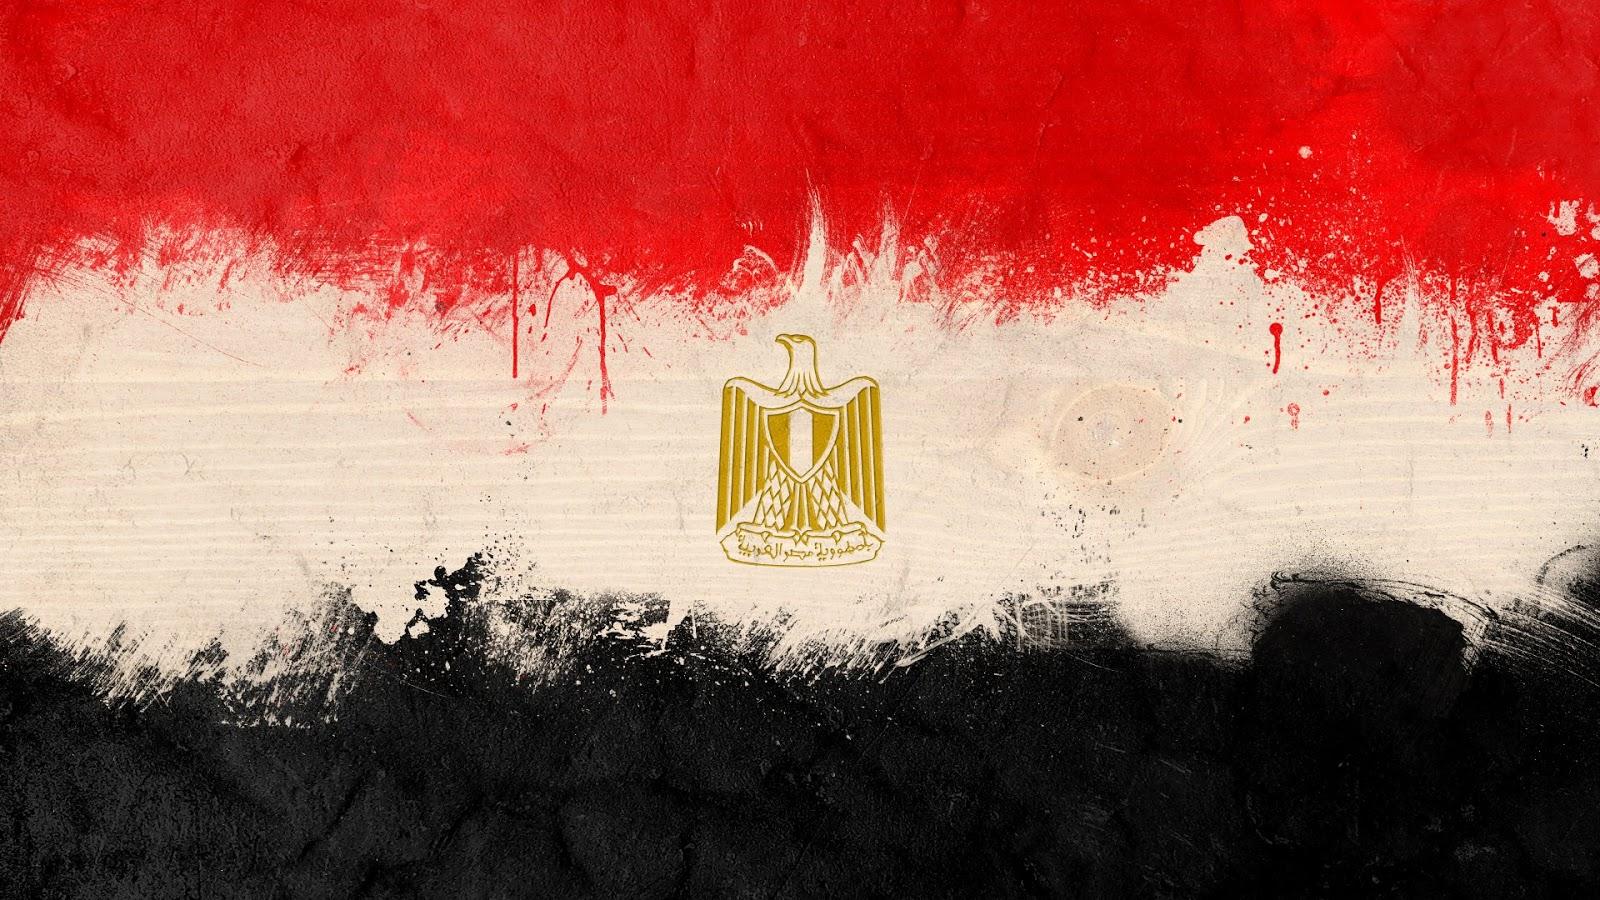 انا مصر Egypt-flag-